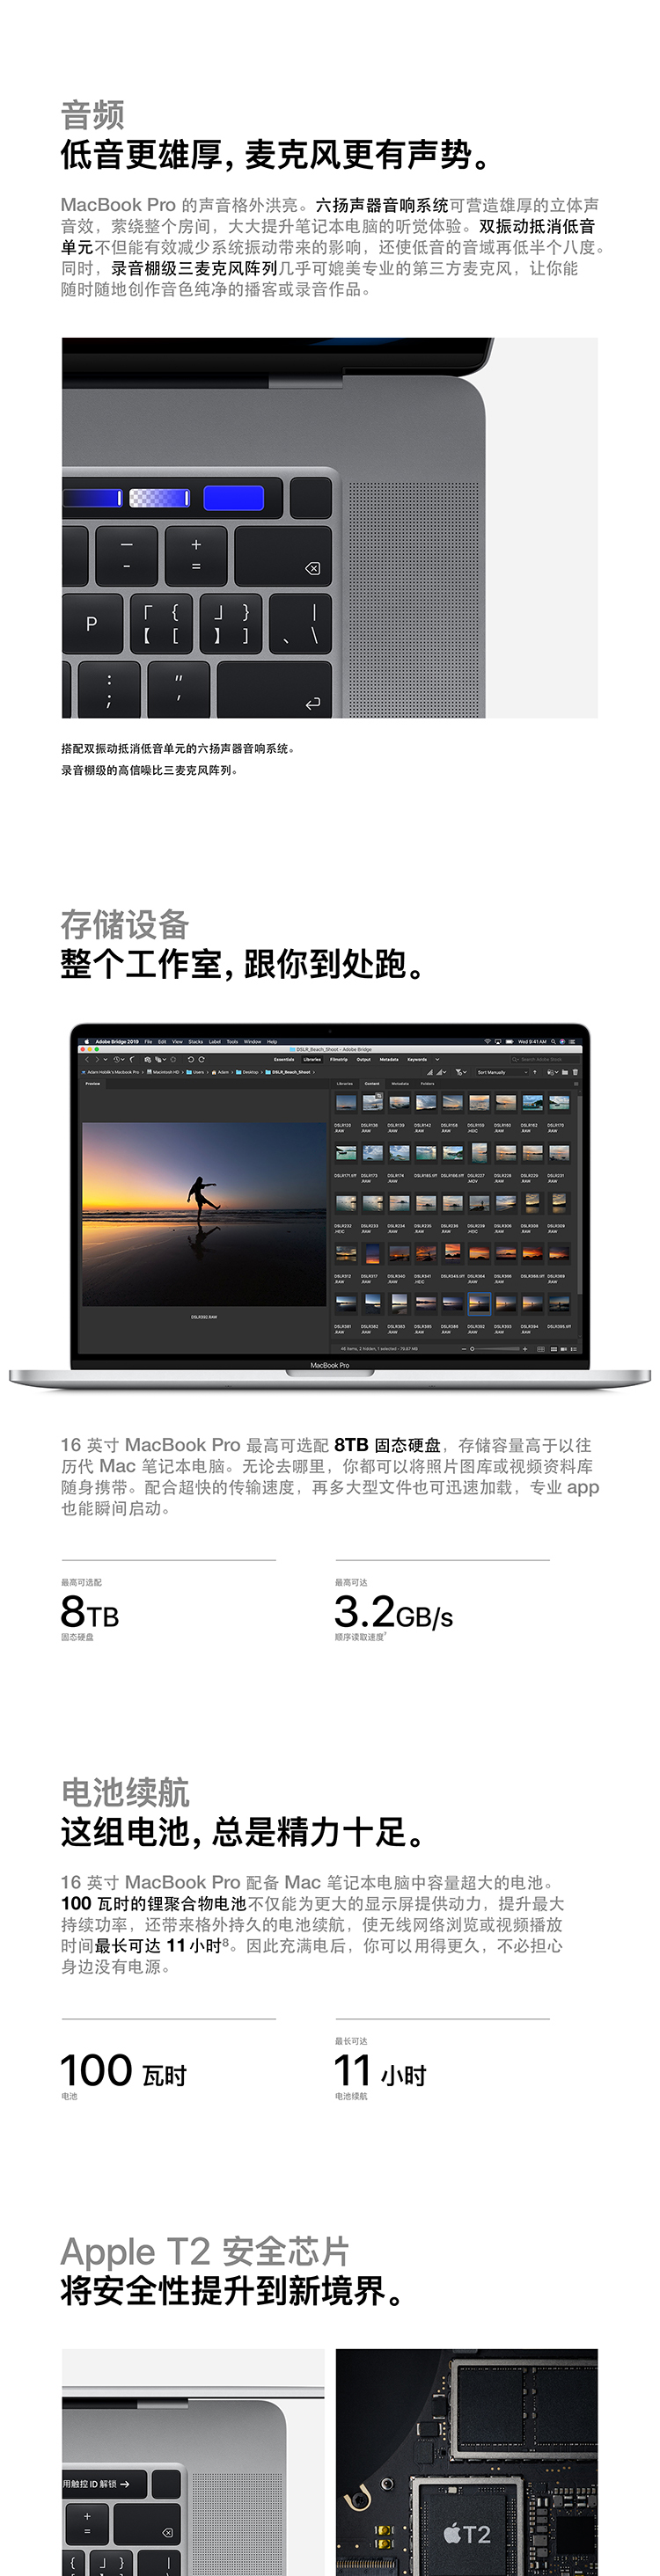 Apple 2019新品 MacBook Pro 16【带触控栏】九代八核i9 16G 1TB 深空灰 Radeon Pro 5500M显卡 笔记本电脑 轻薄本 MVVK2CH/A